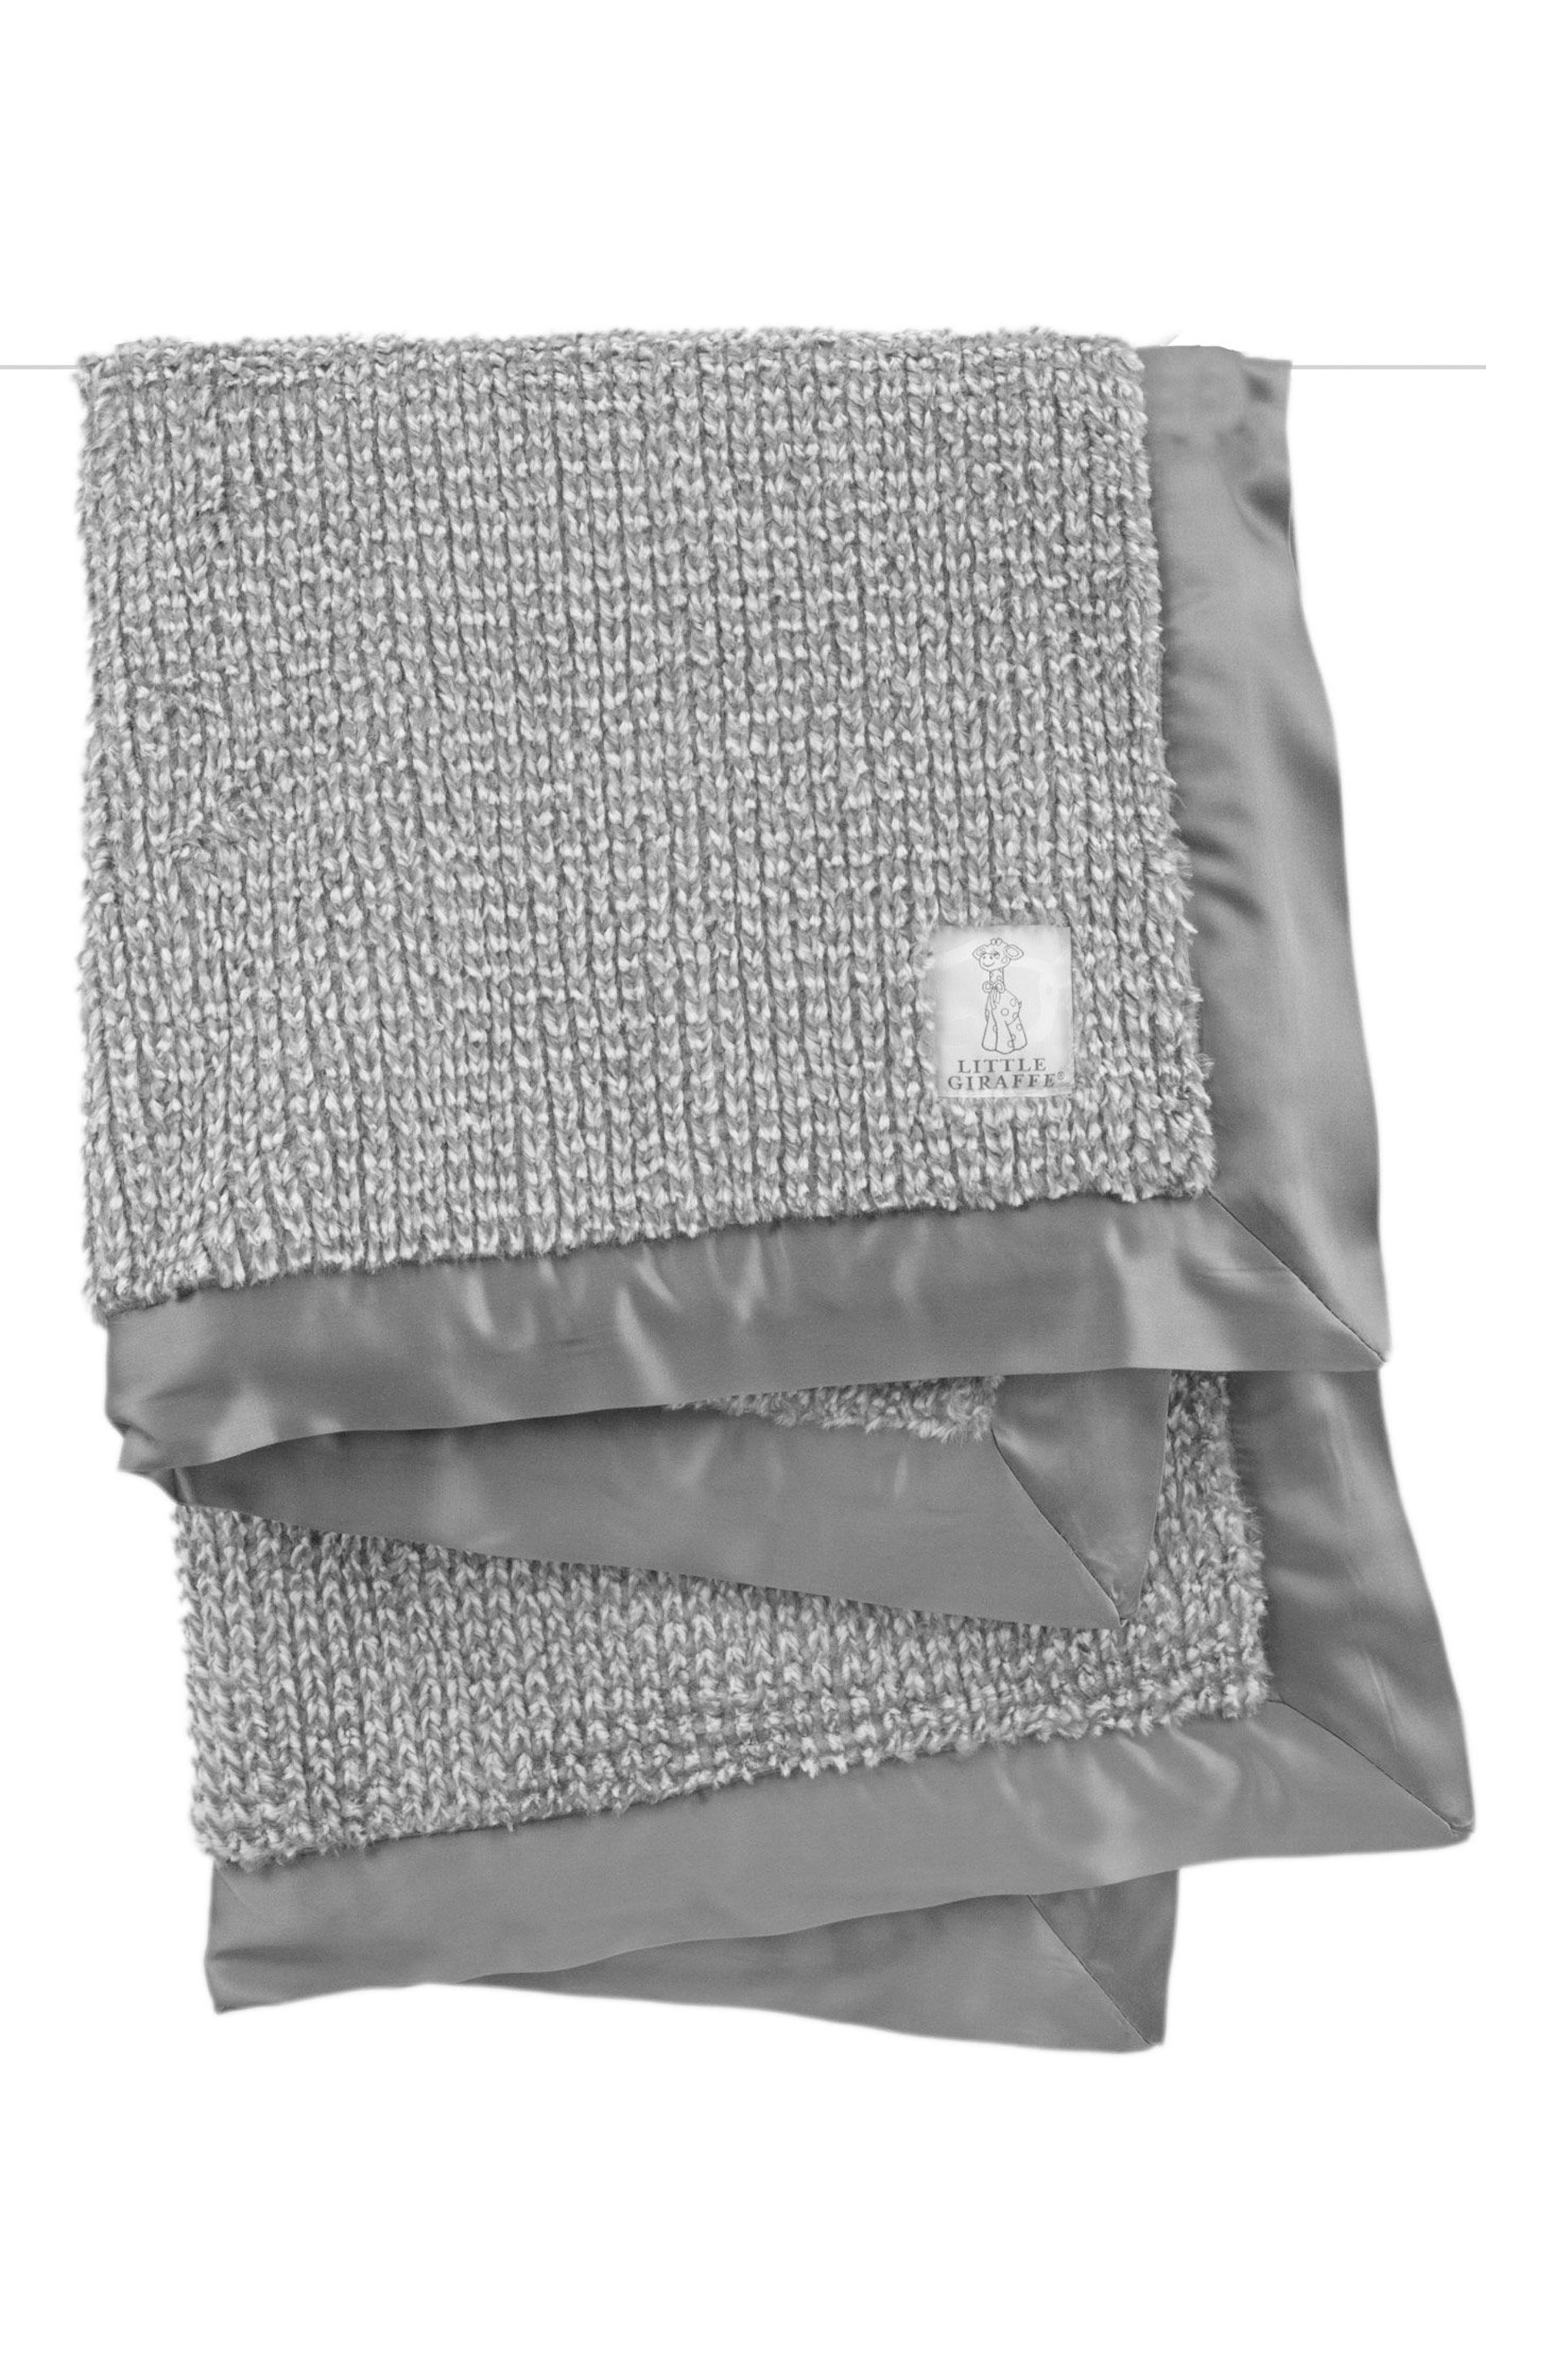 Luxe Herringbone Blanket,                         Main,                         color, CHARCOAL